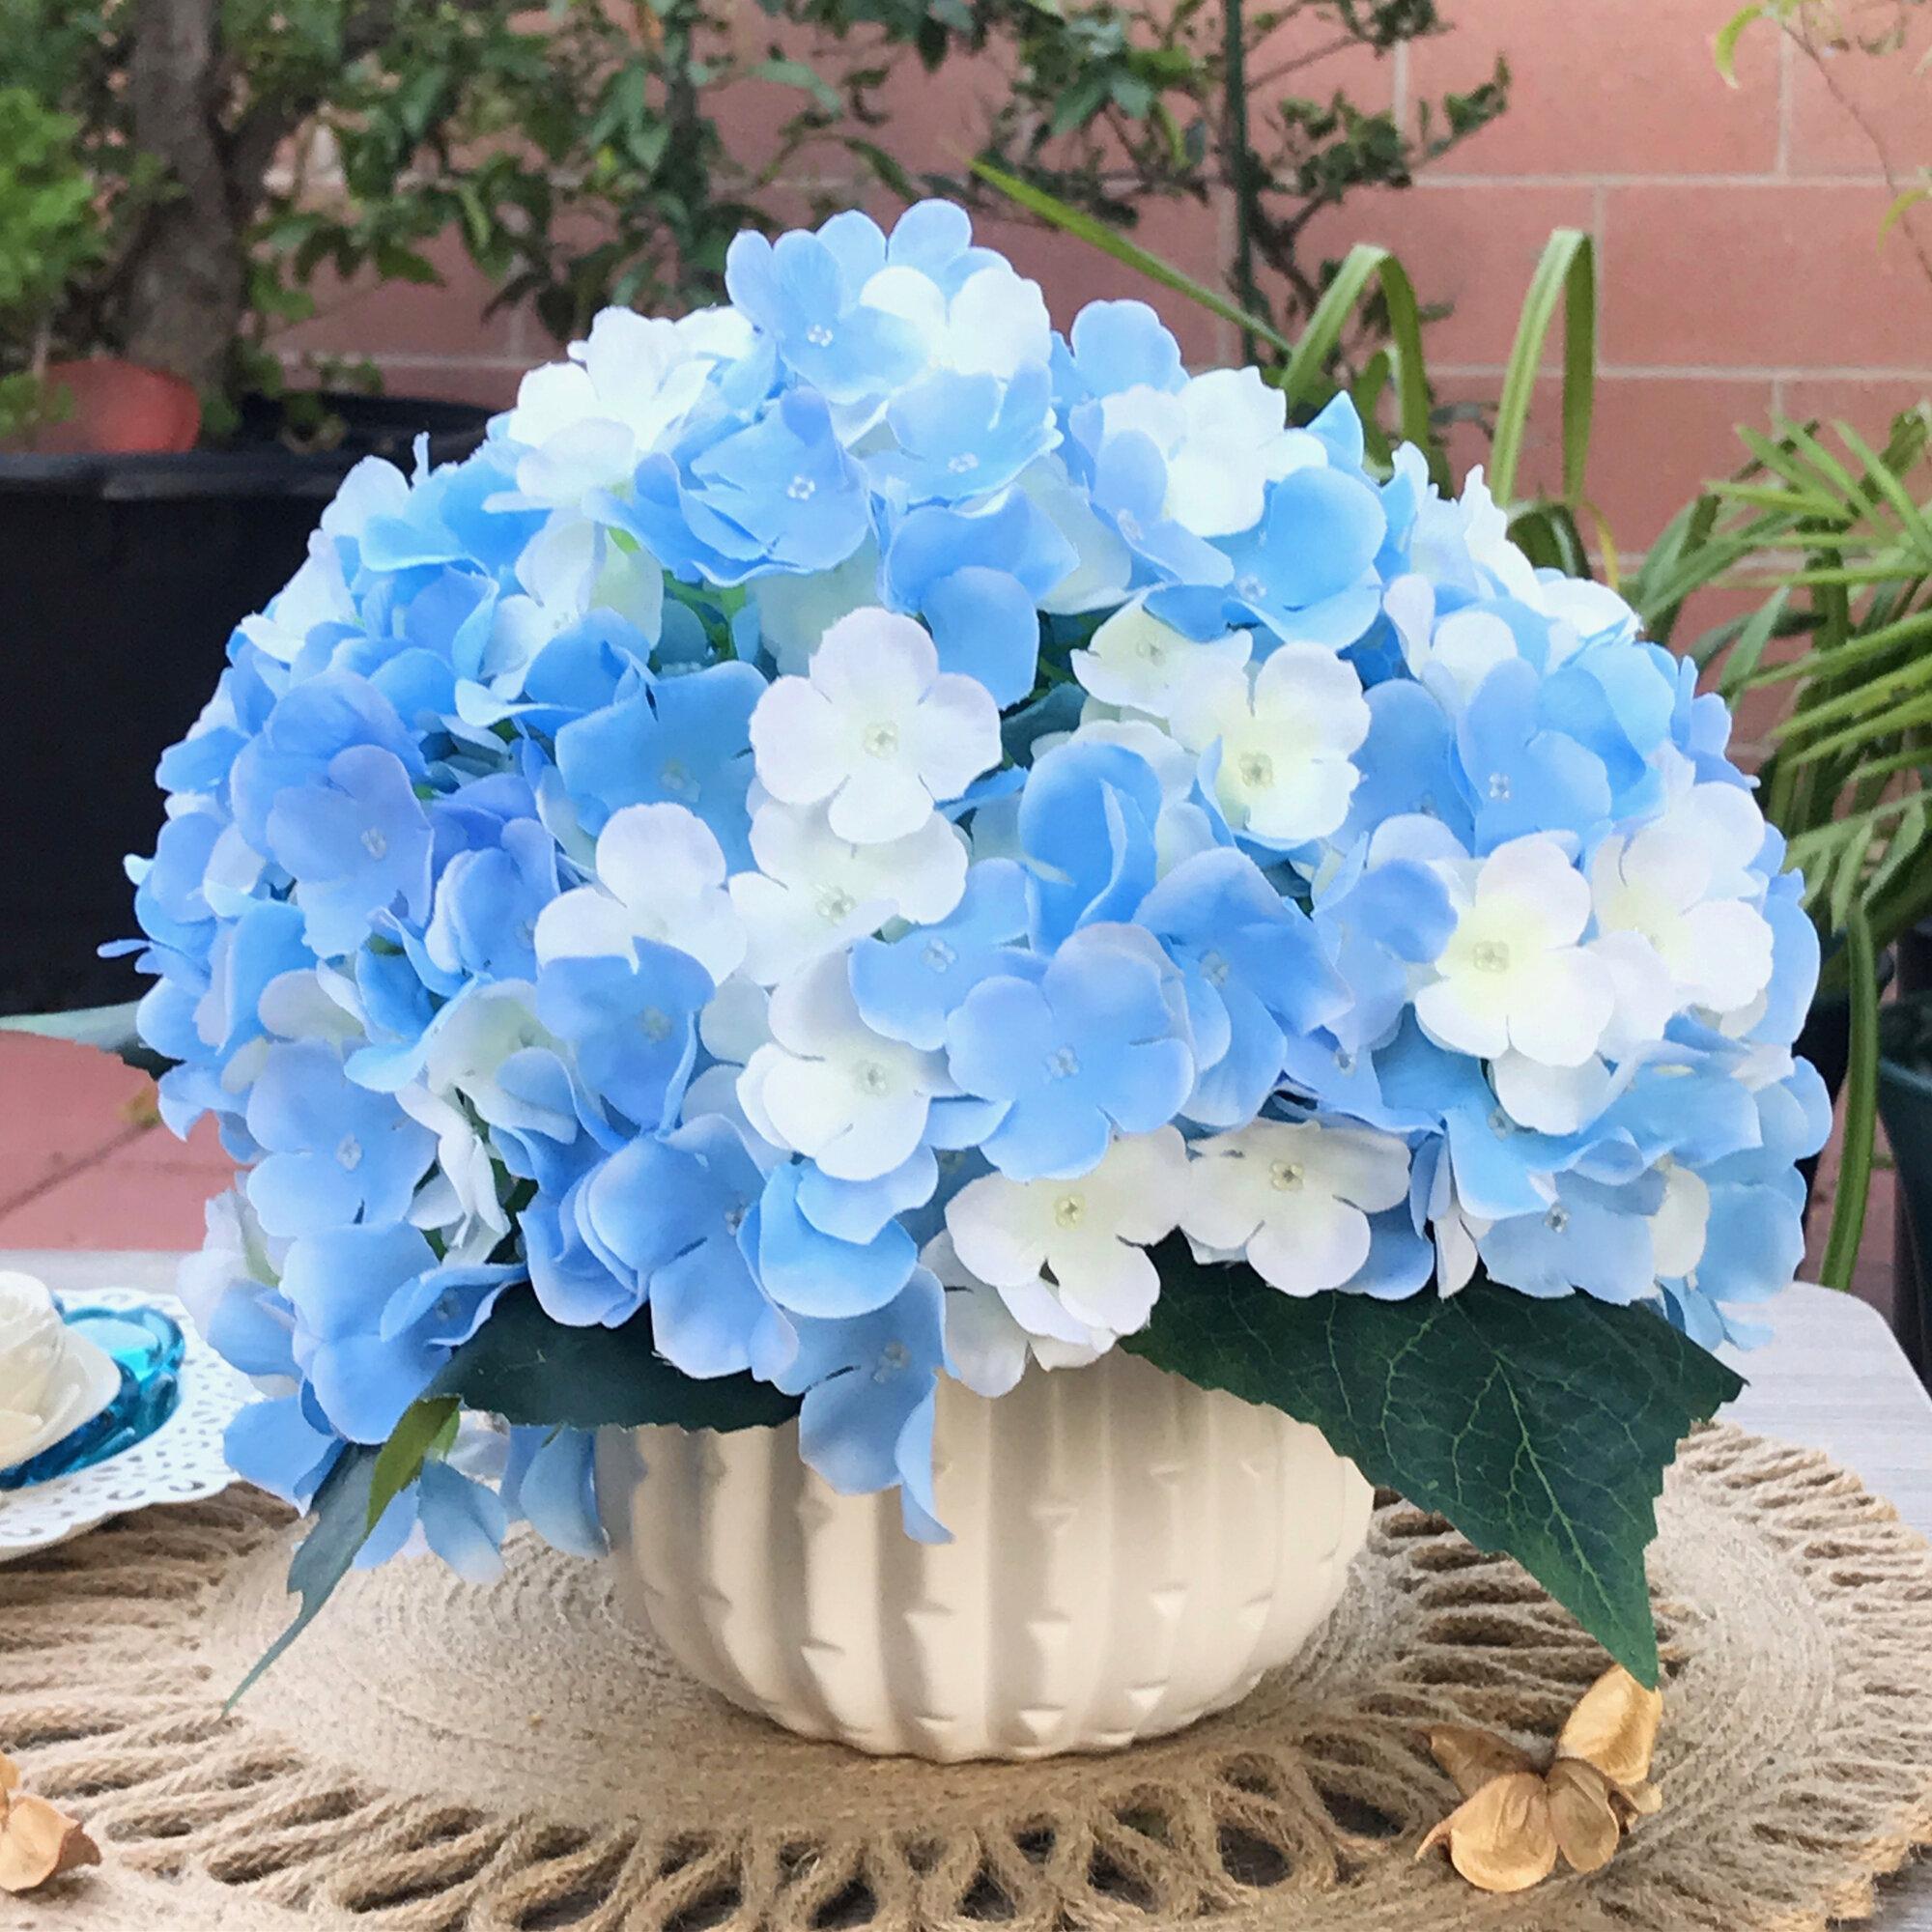 House Of Hampton Artificial Hydrangeas Floral Arrangements And